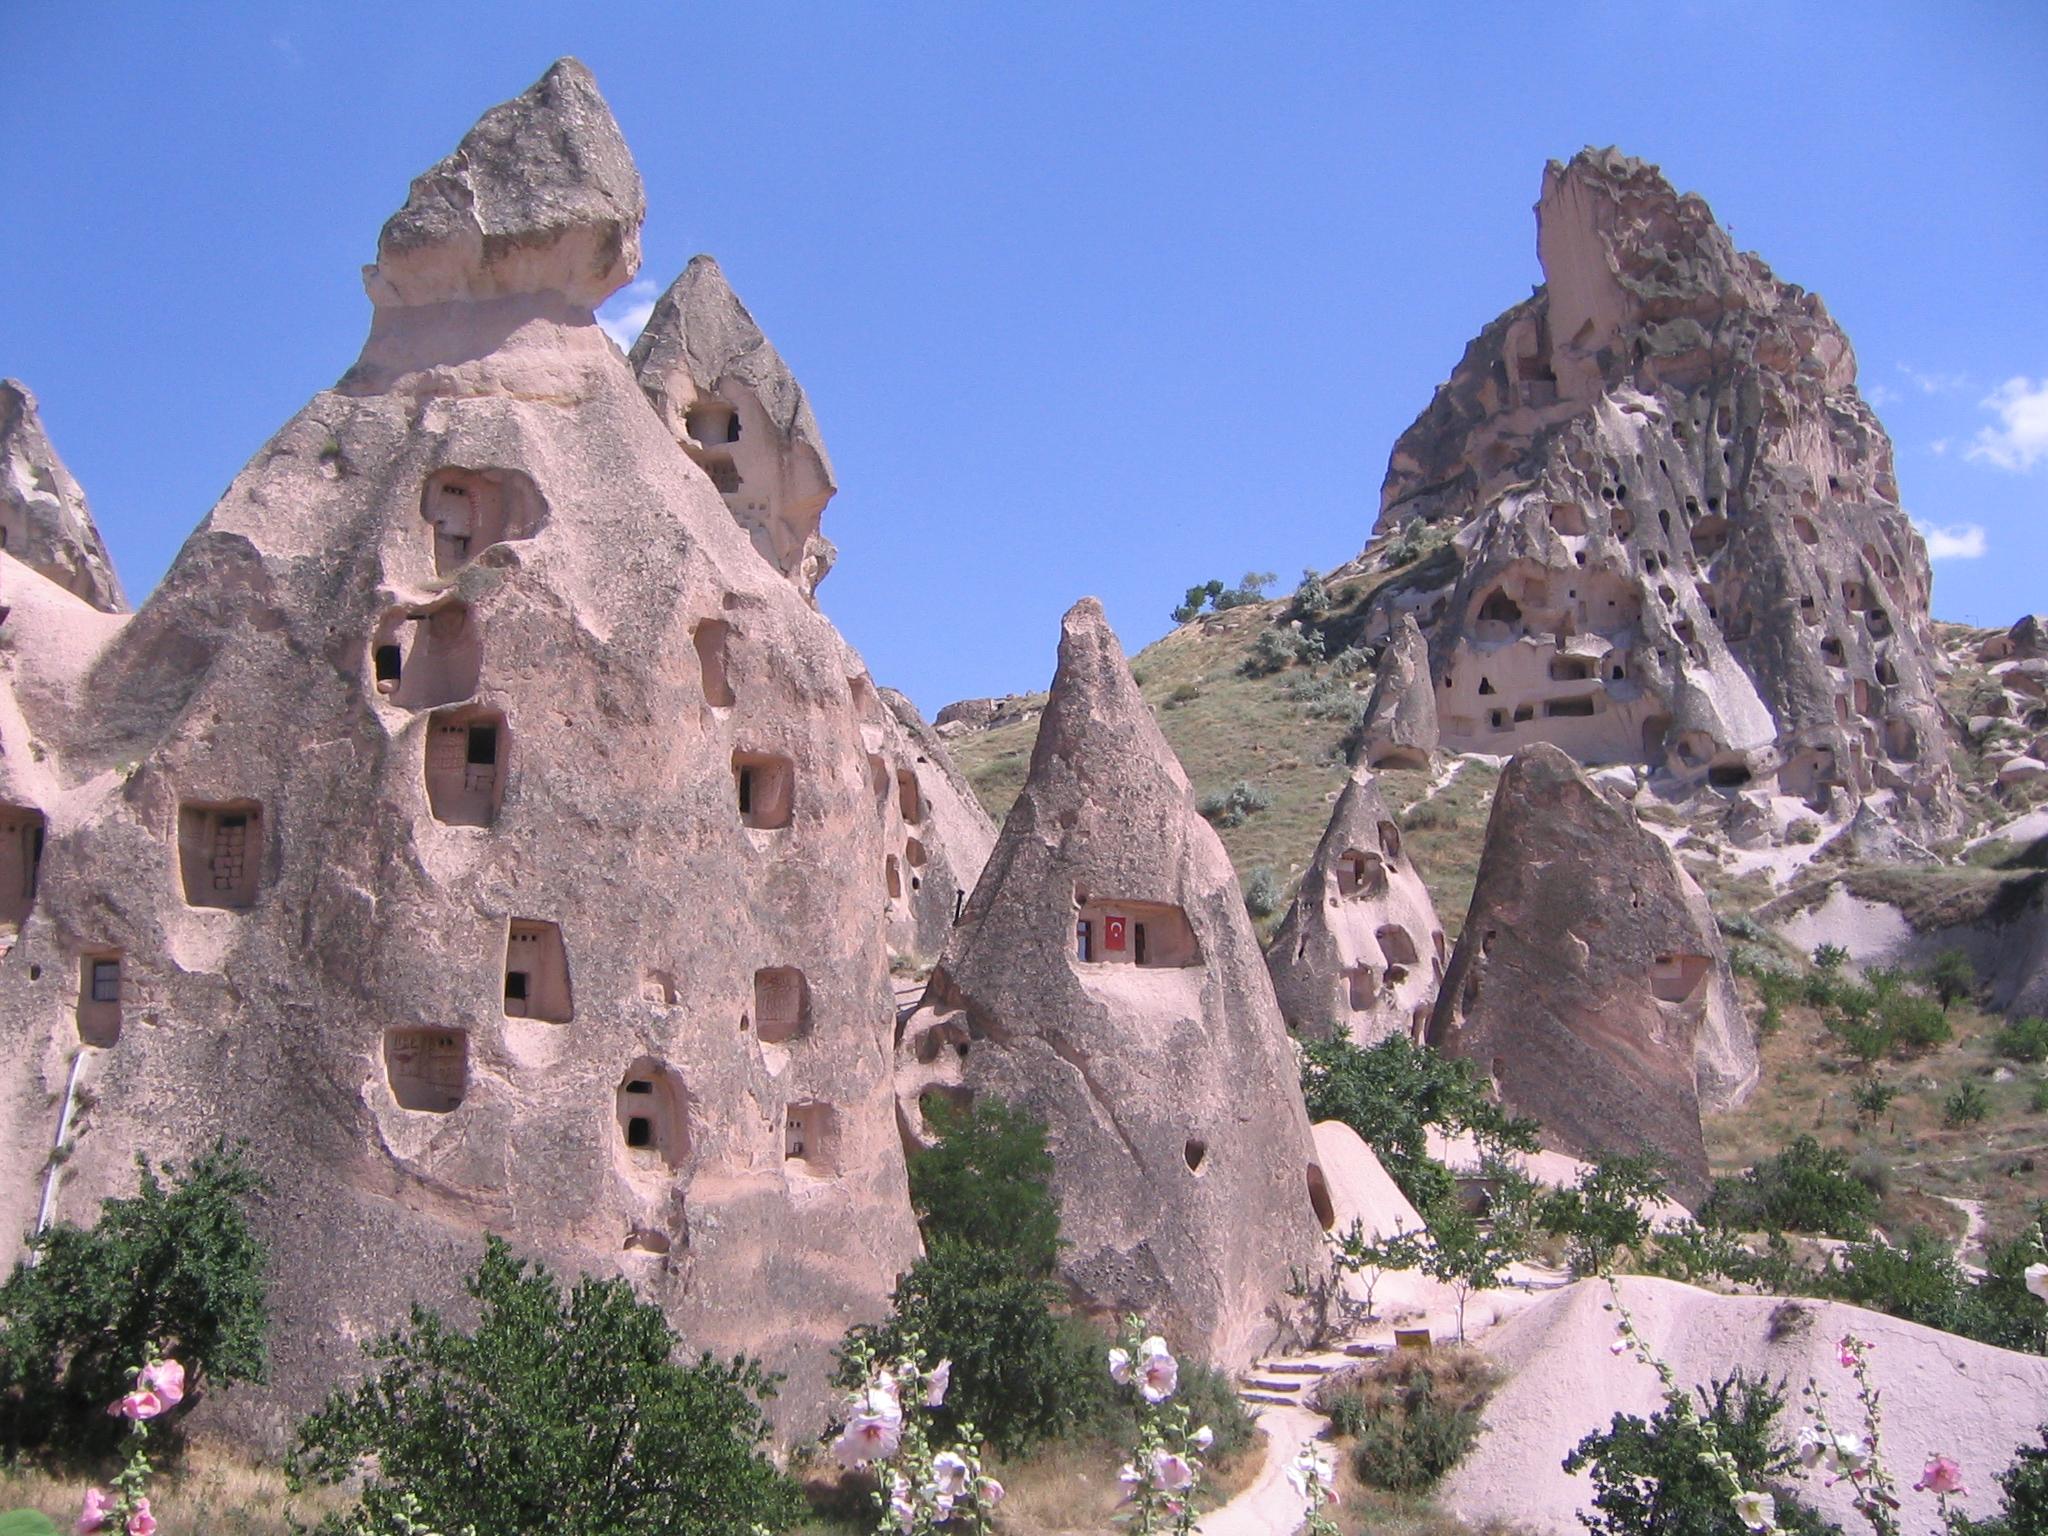 File:Cappadocia. Museo al Aire Libre de Göreme 3.JPG - Wikimedia Commons